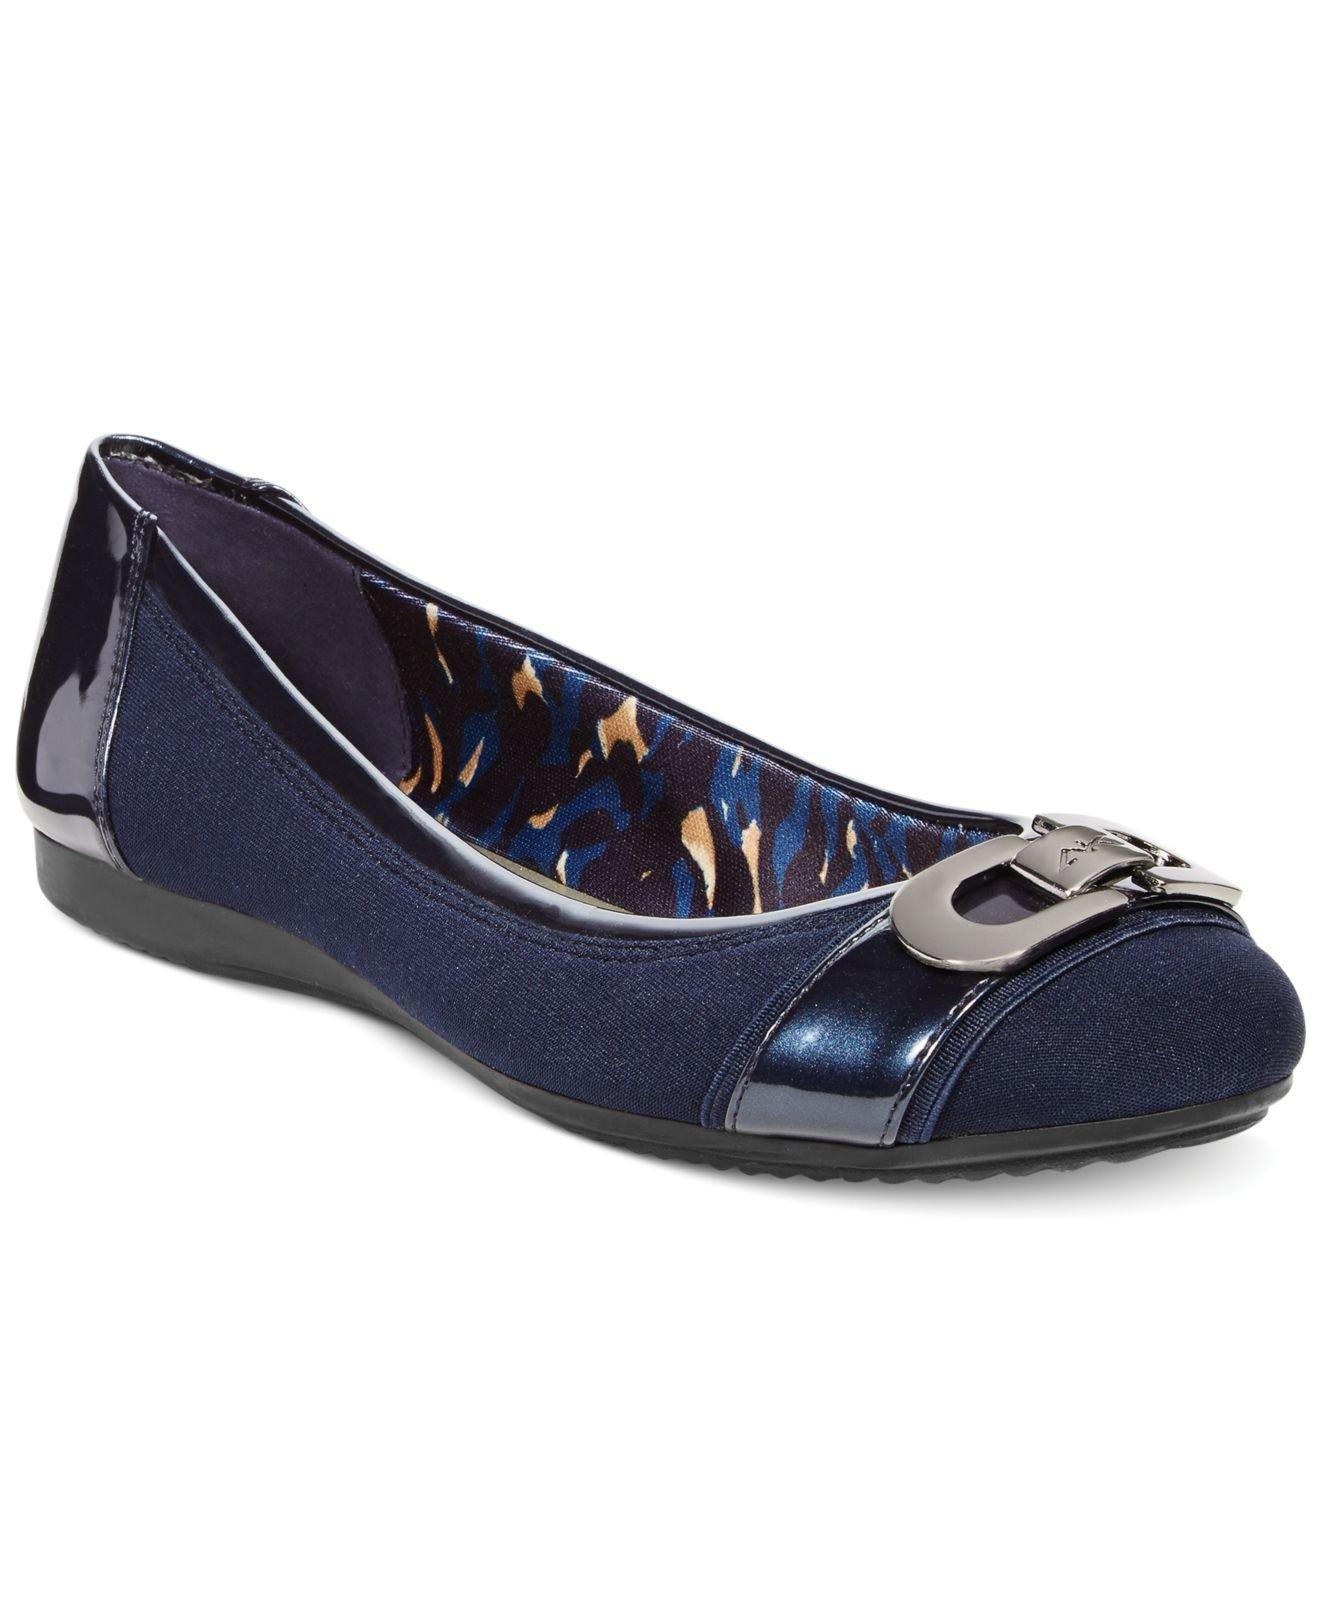 Fabric Flats Womens Shoes